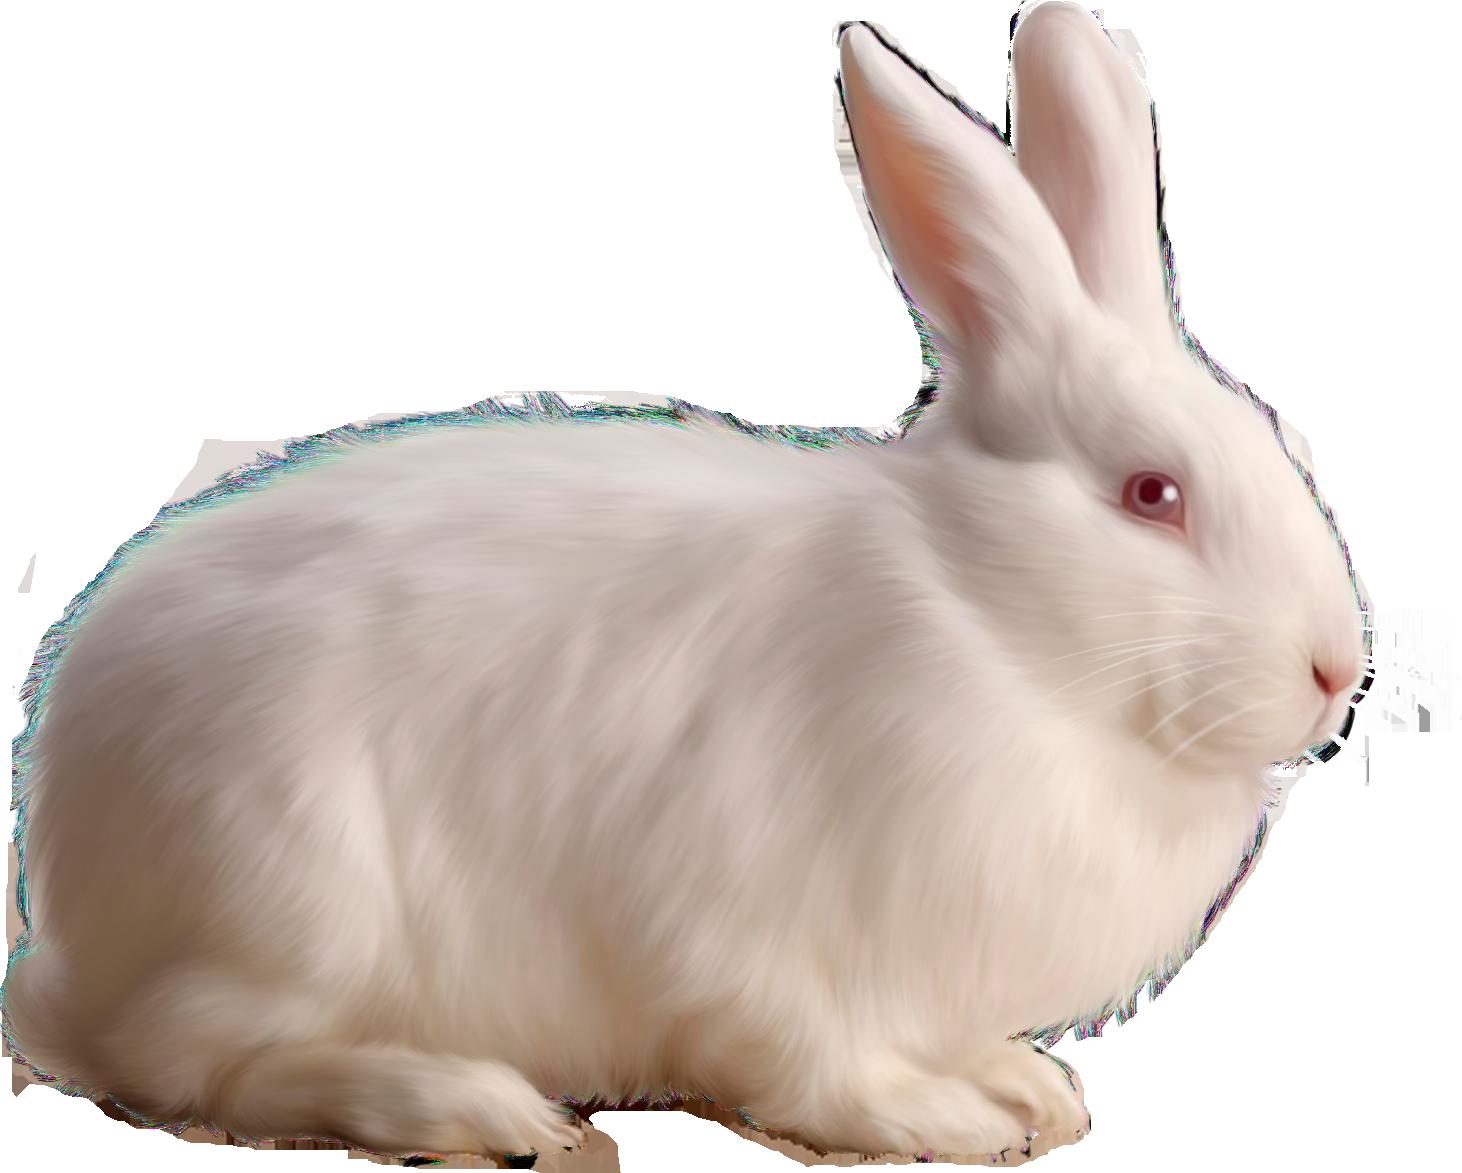 White Rabbit PNG Image - Rabbit PNG